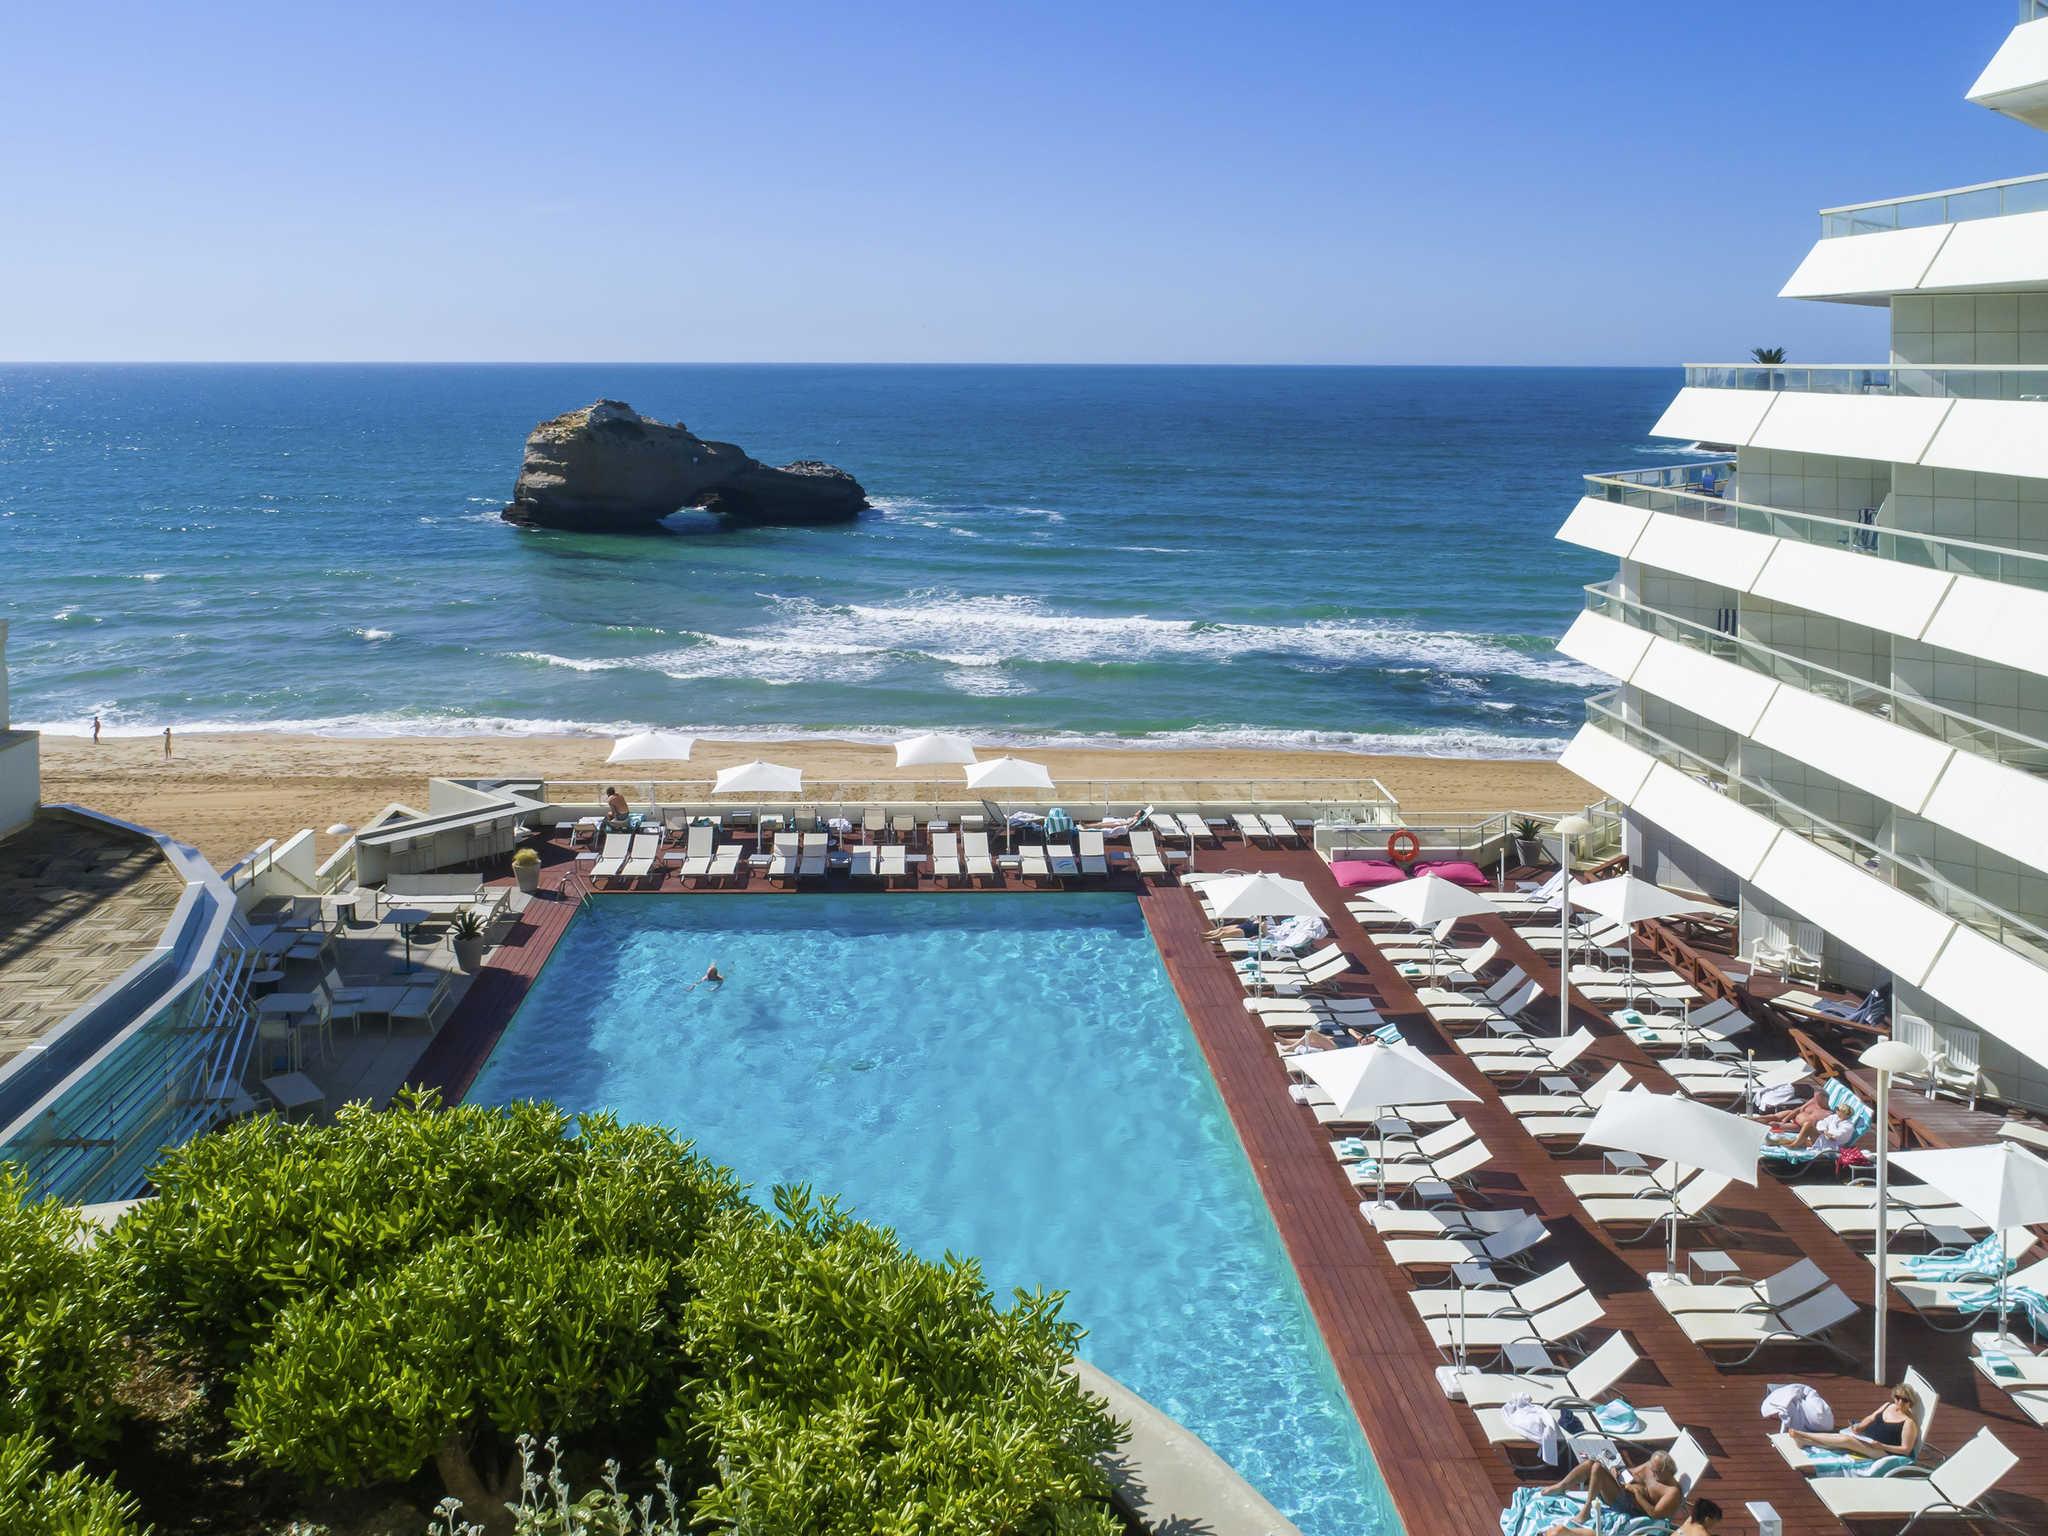 Hotell – Sofitel Biarritz le Miramar Thalassa sea & spa